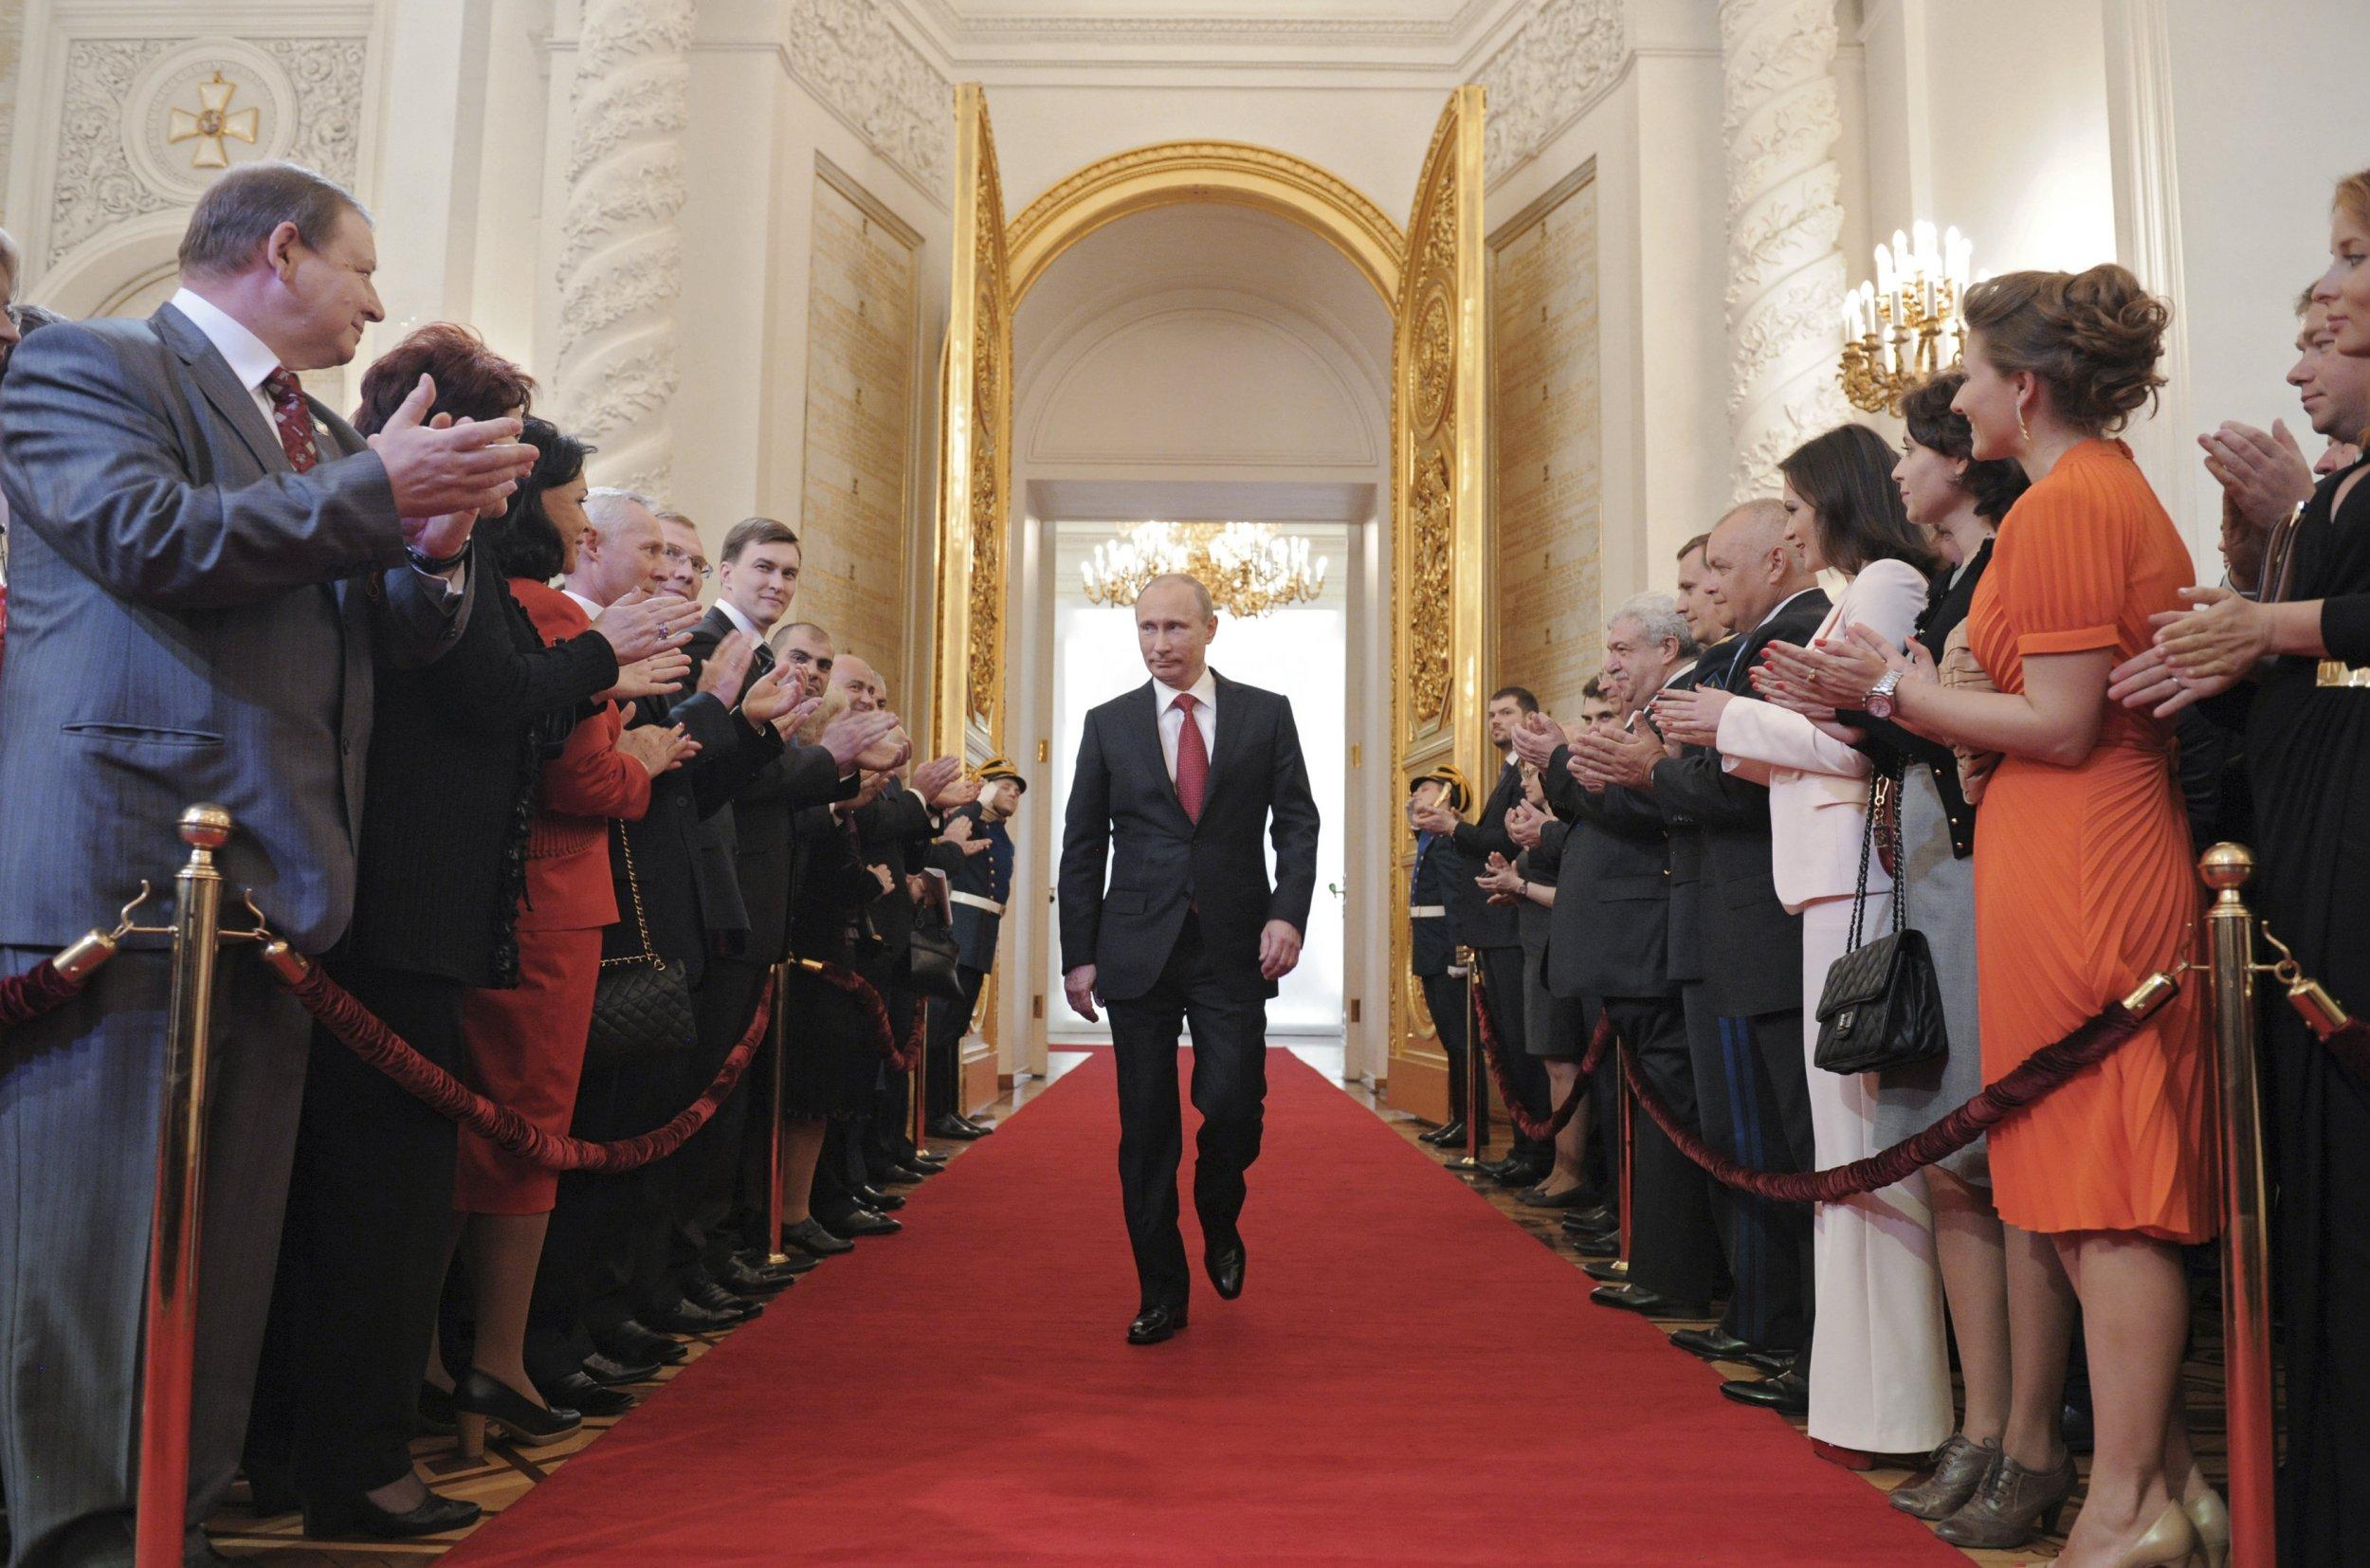 Putin walks to applause in the Kremlin